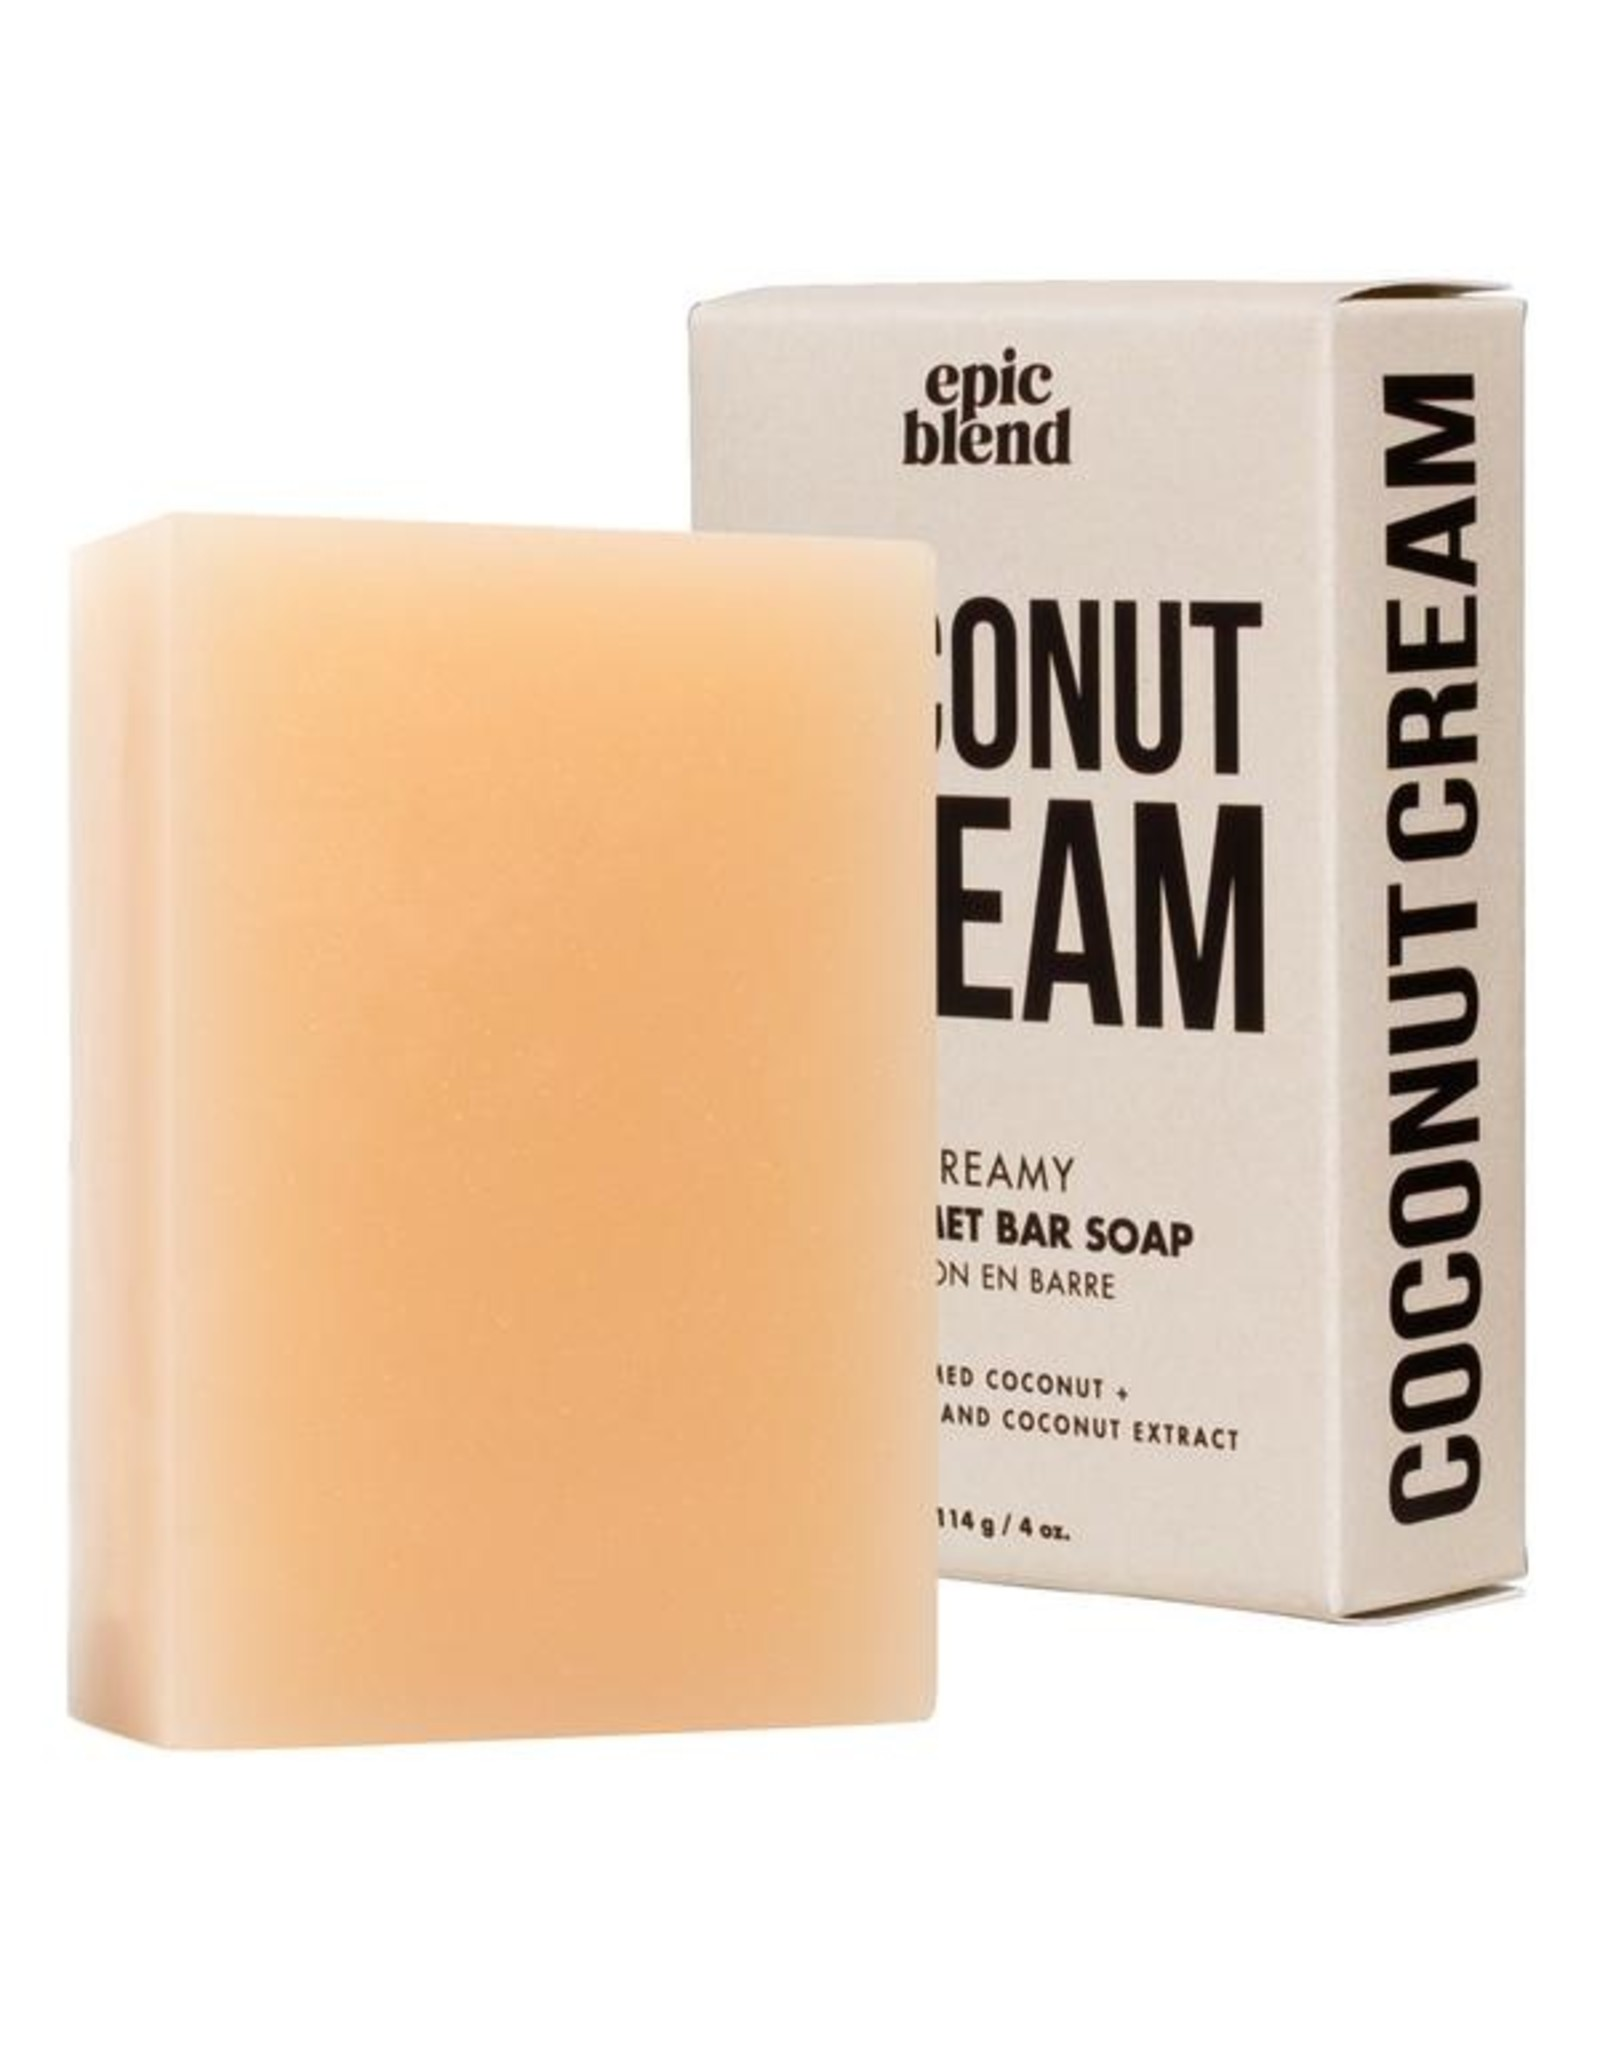 Epic Blend Coconut Cream Bar Soap